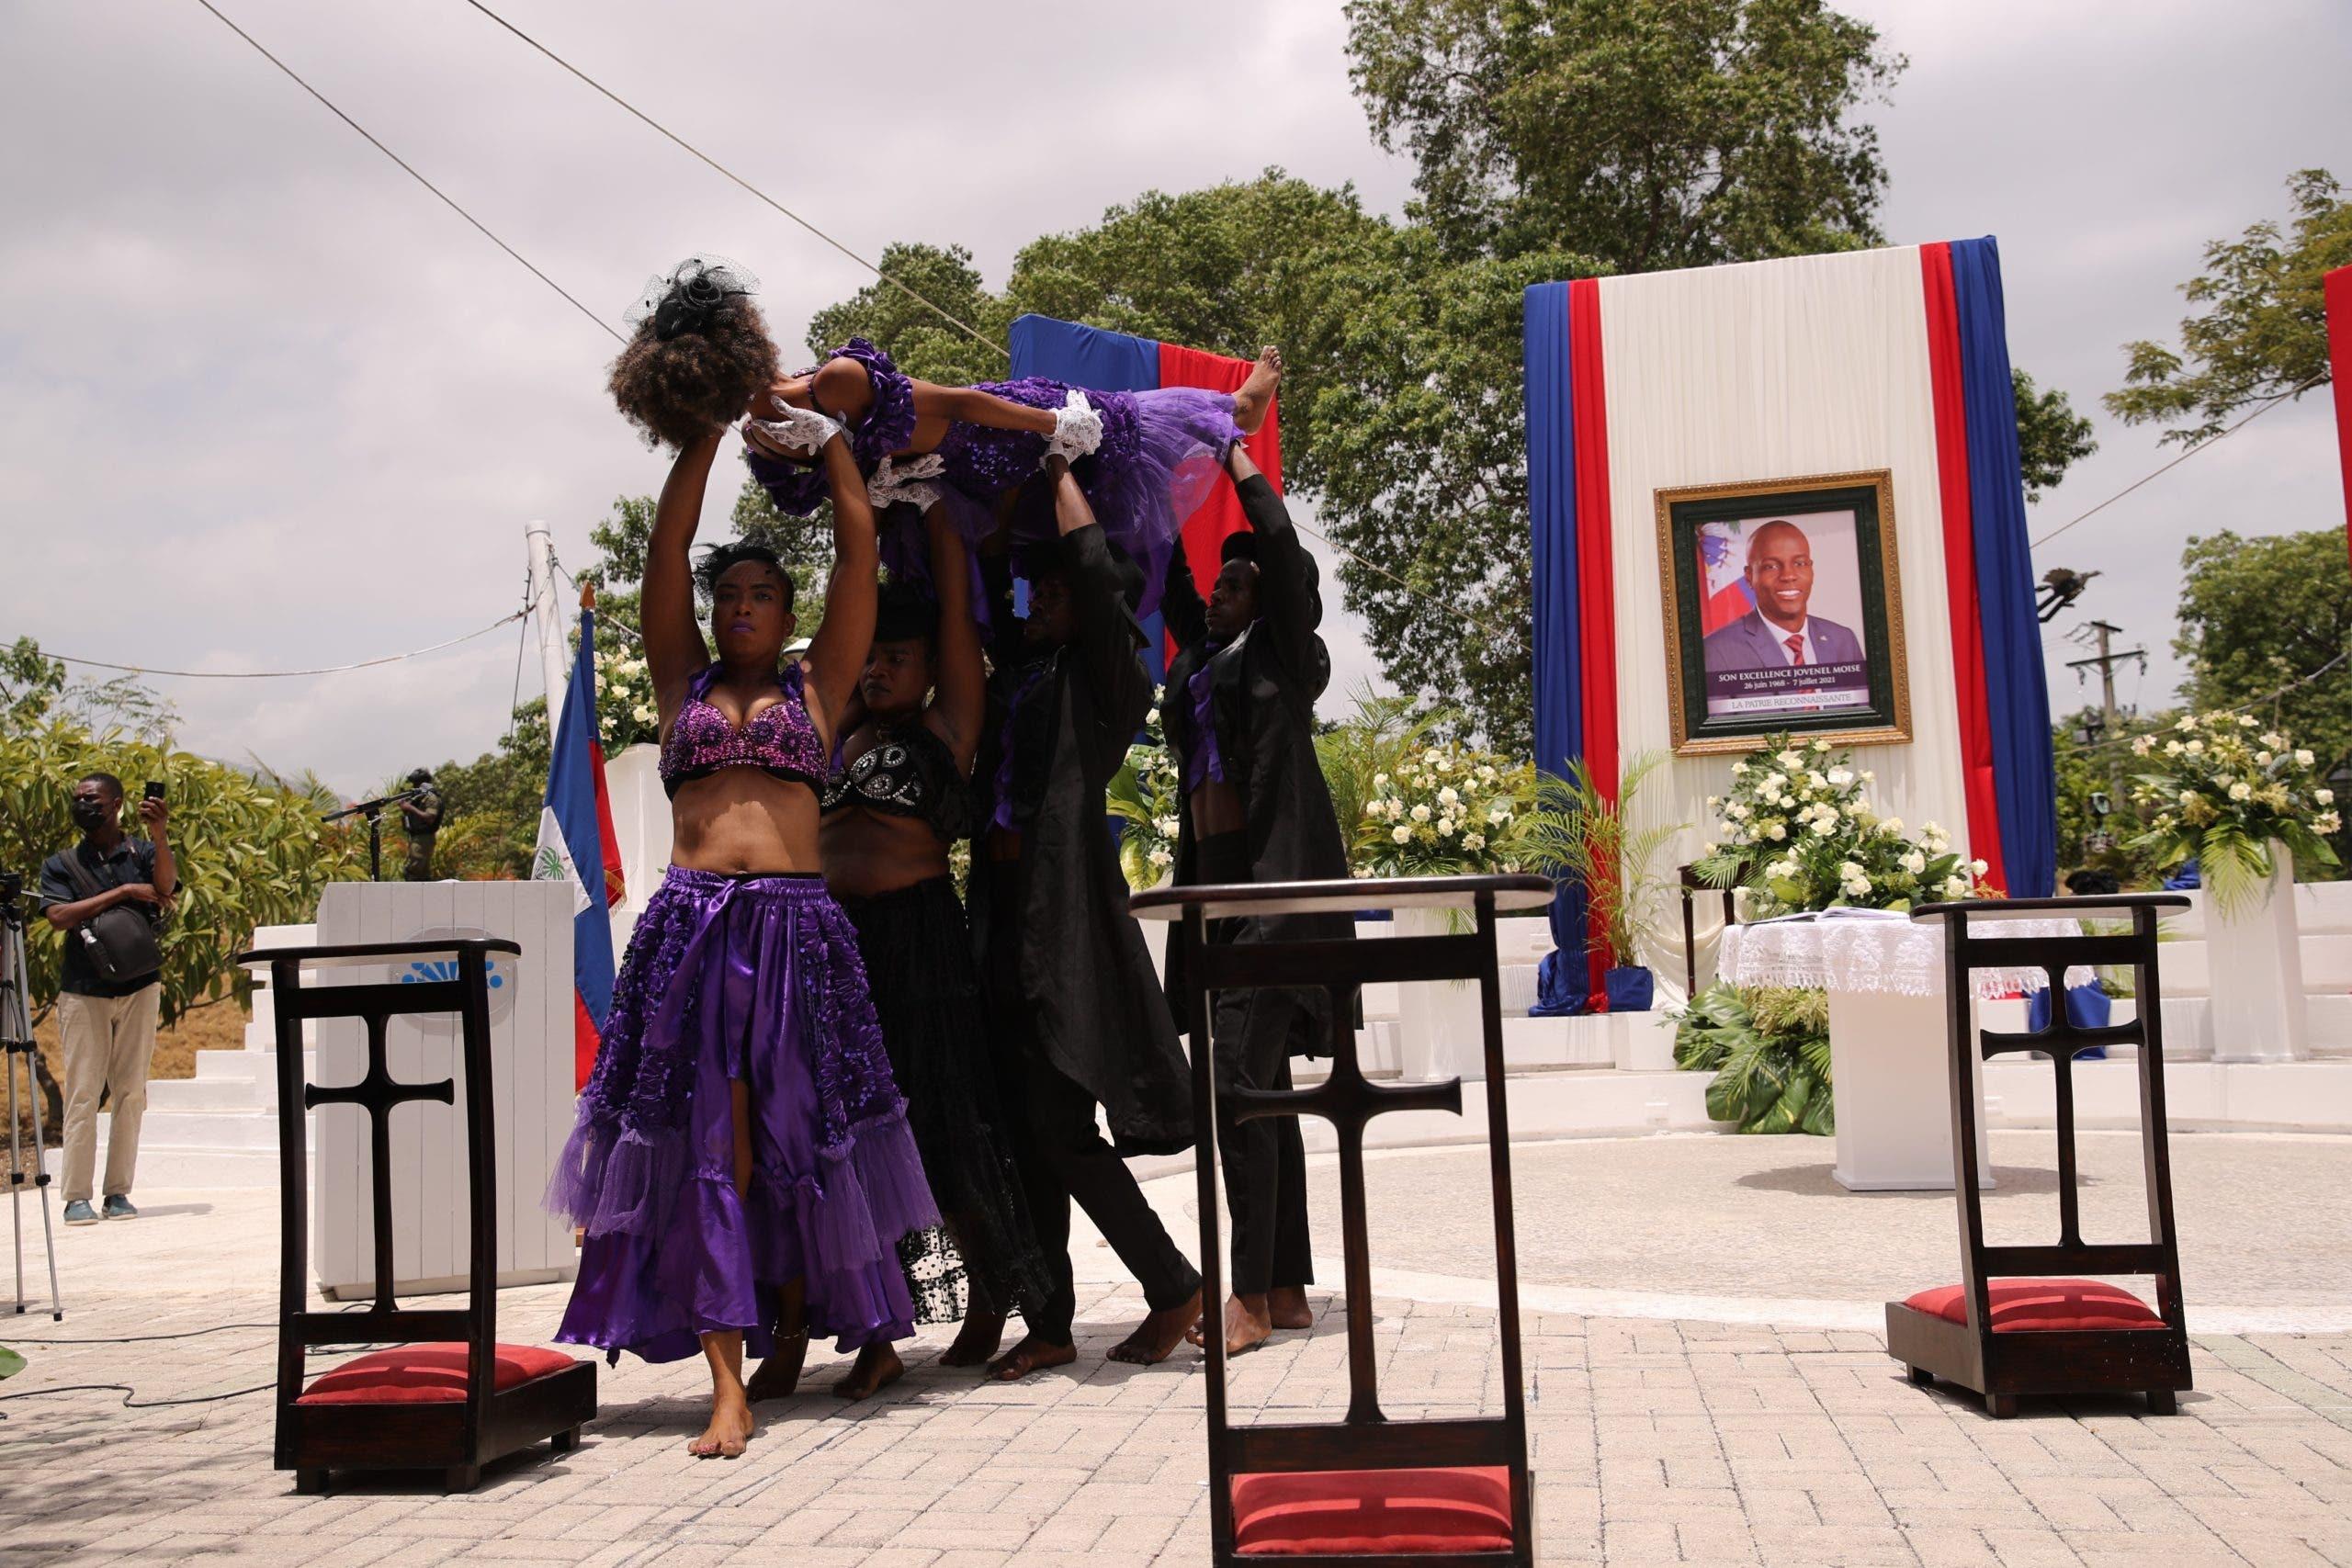 Gobierno haitiano rinde homenaje al asesinado presidente Jovenel Moise